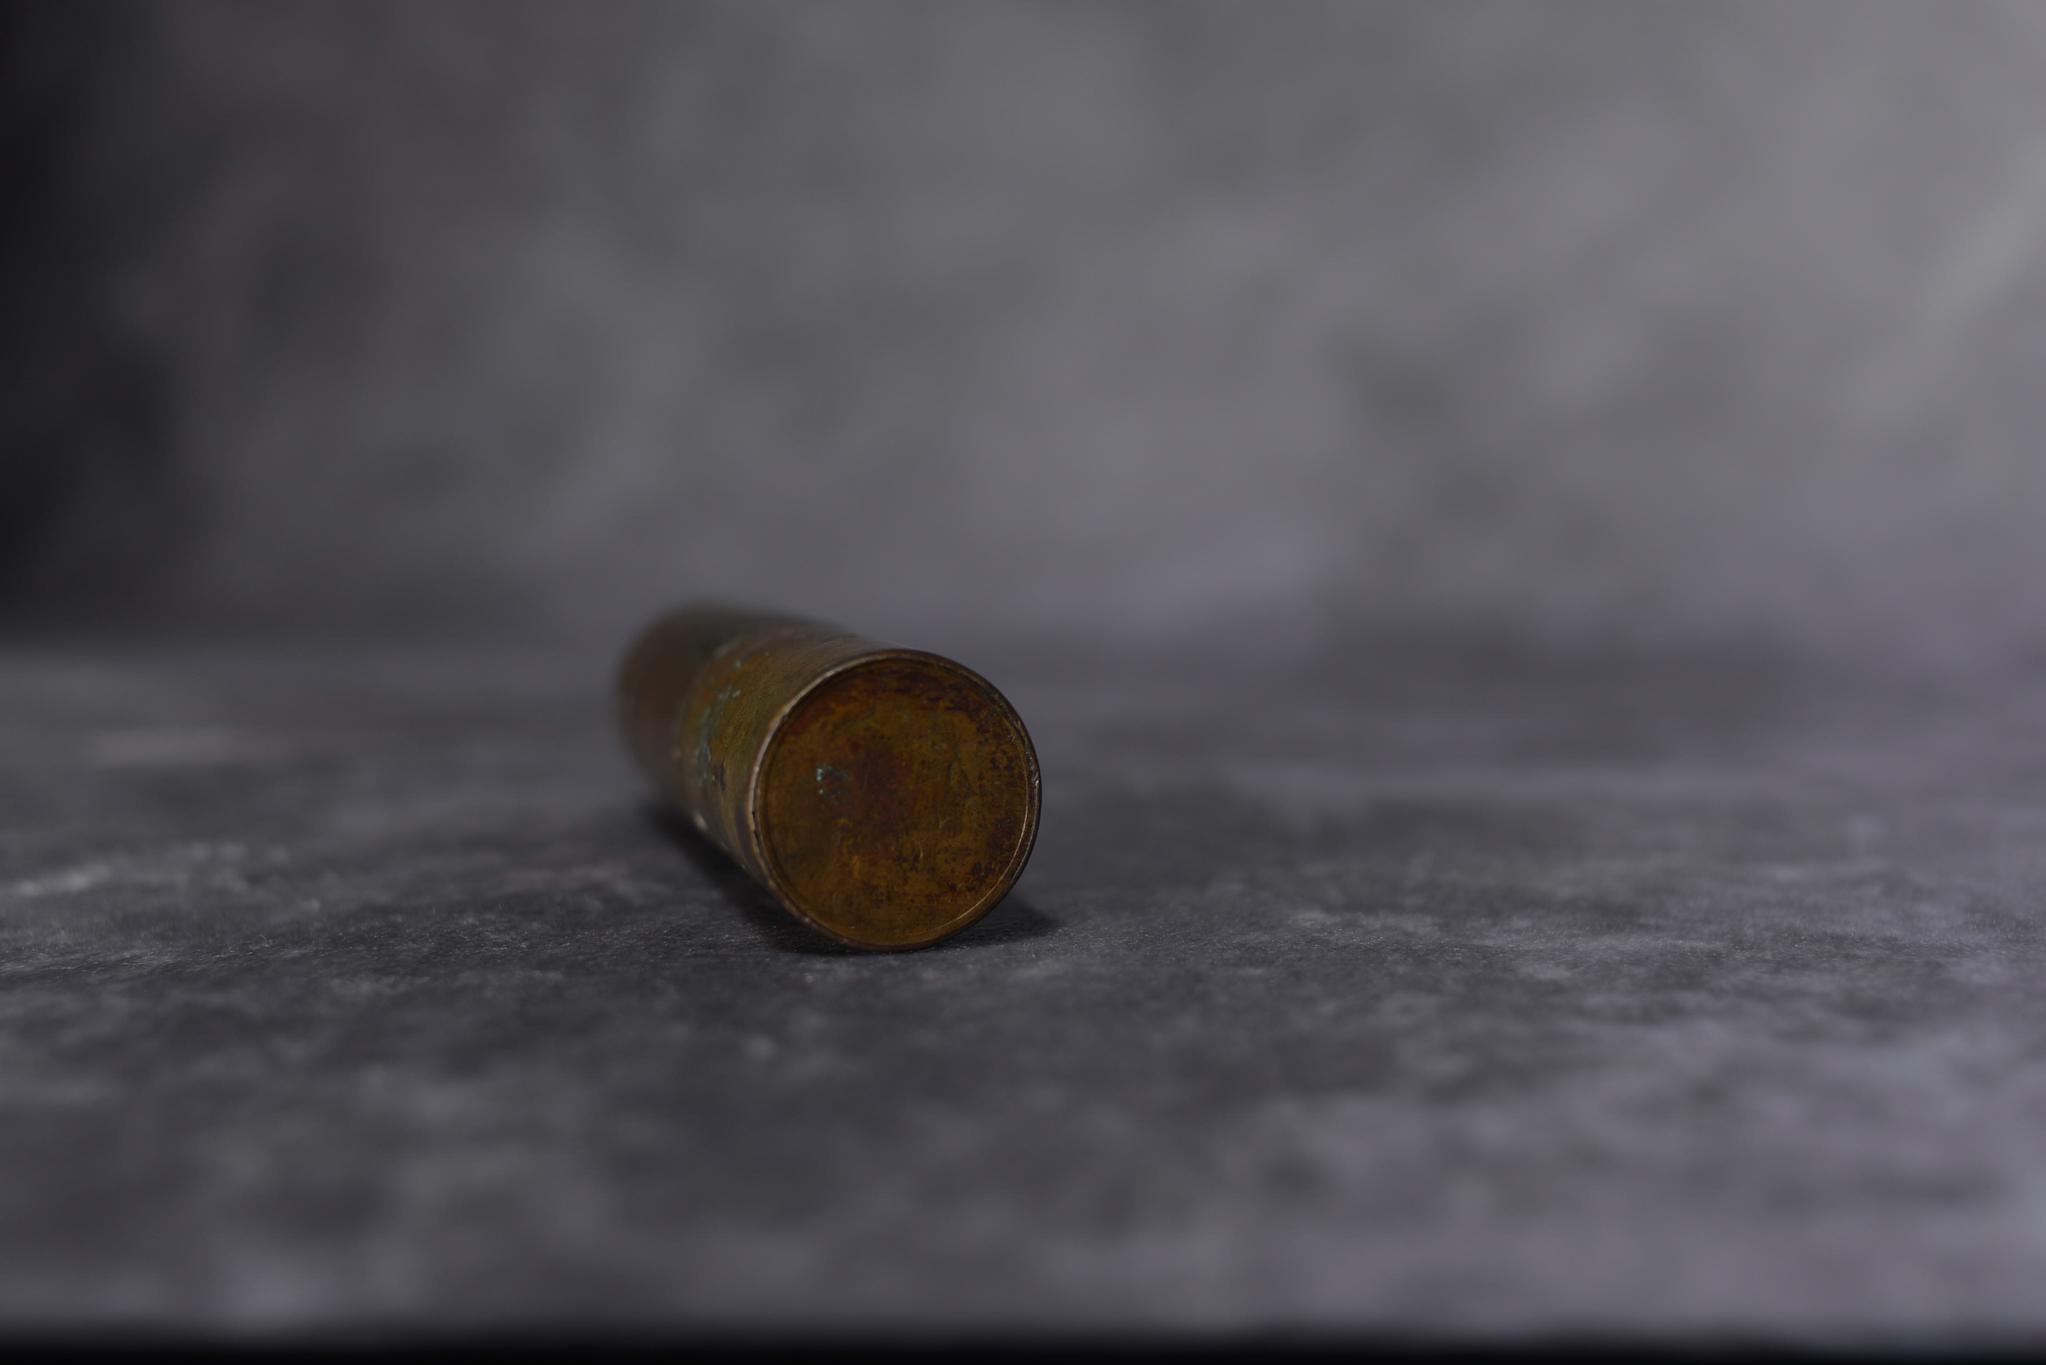 Lot 35 - WWI Trench art cigarette lighter